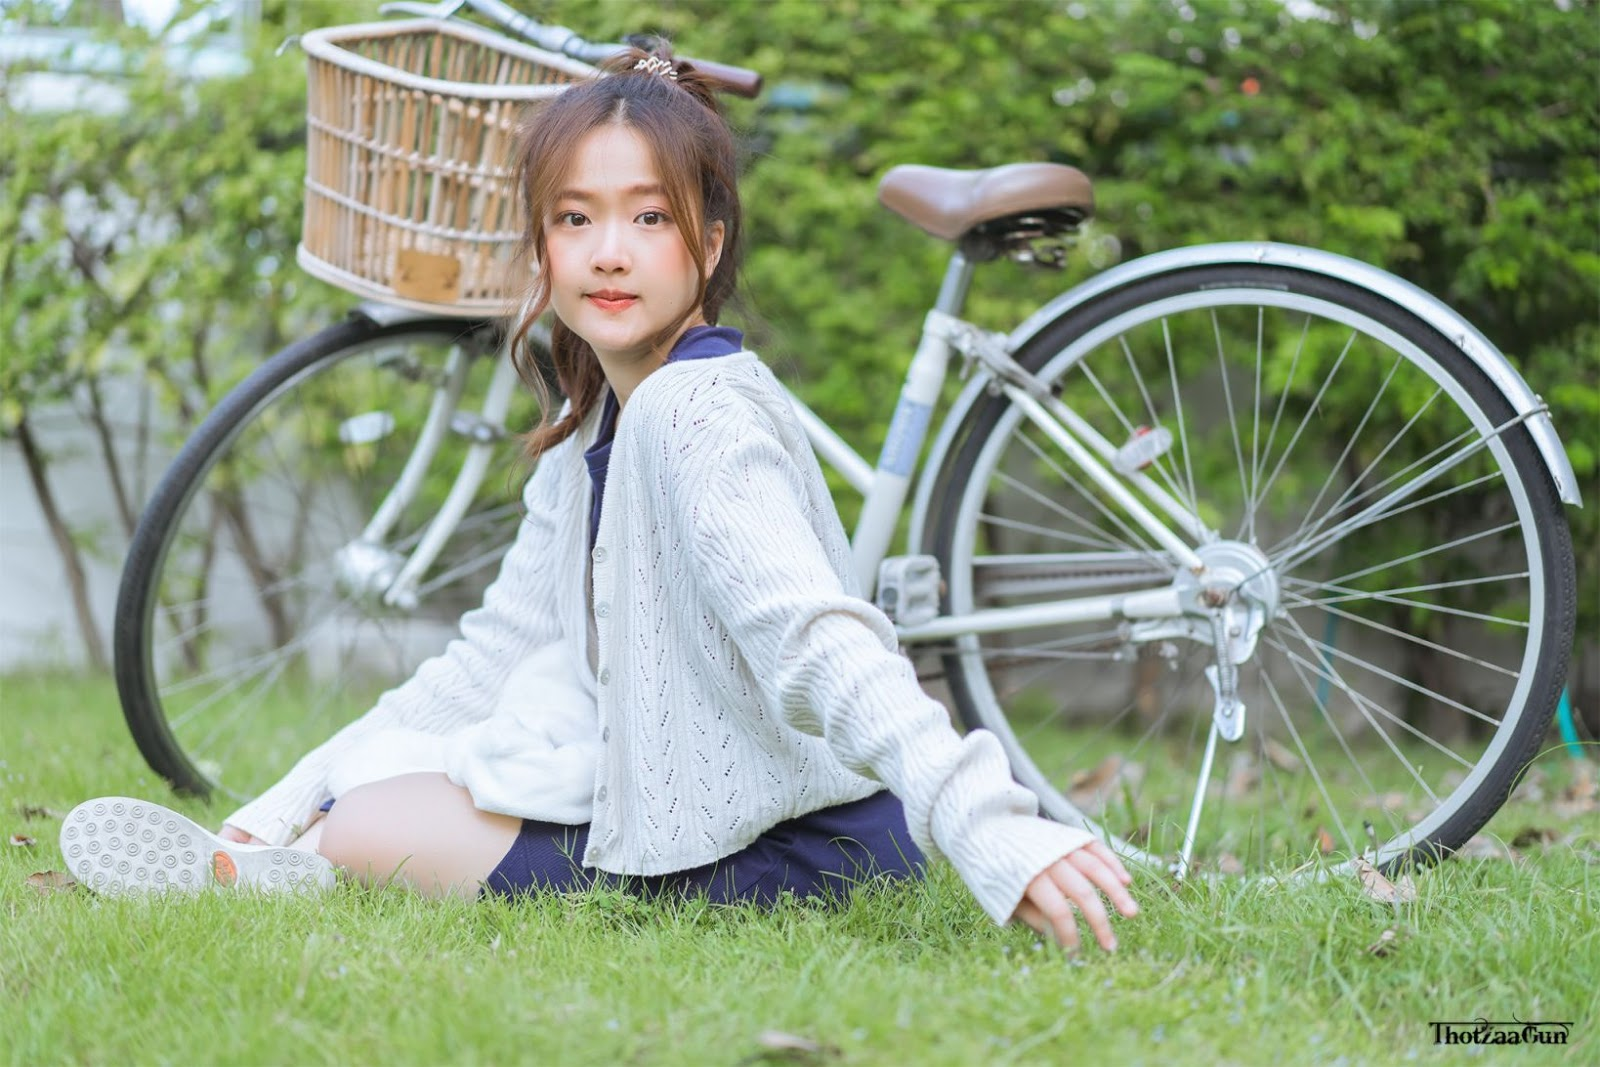 Cutest Thailand model - Kamonravee Korsampan (Aueyauey เอ๋ยเอ้ย) - How to drive a bike - TruePic.net